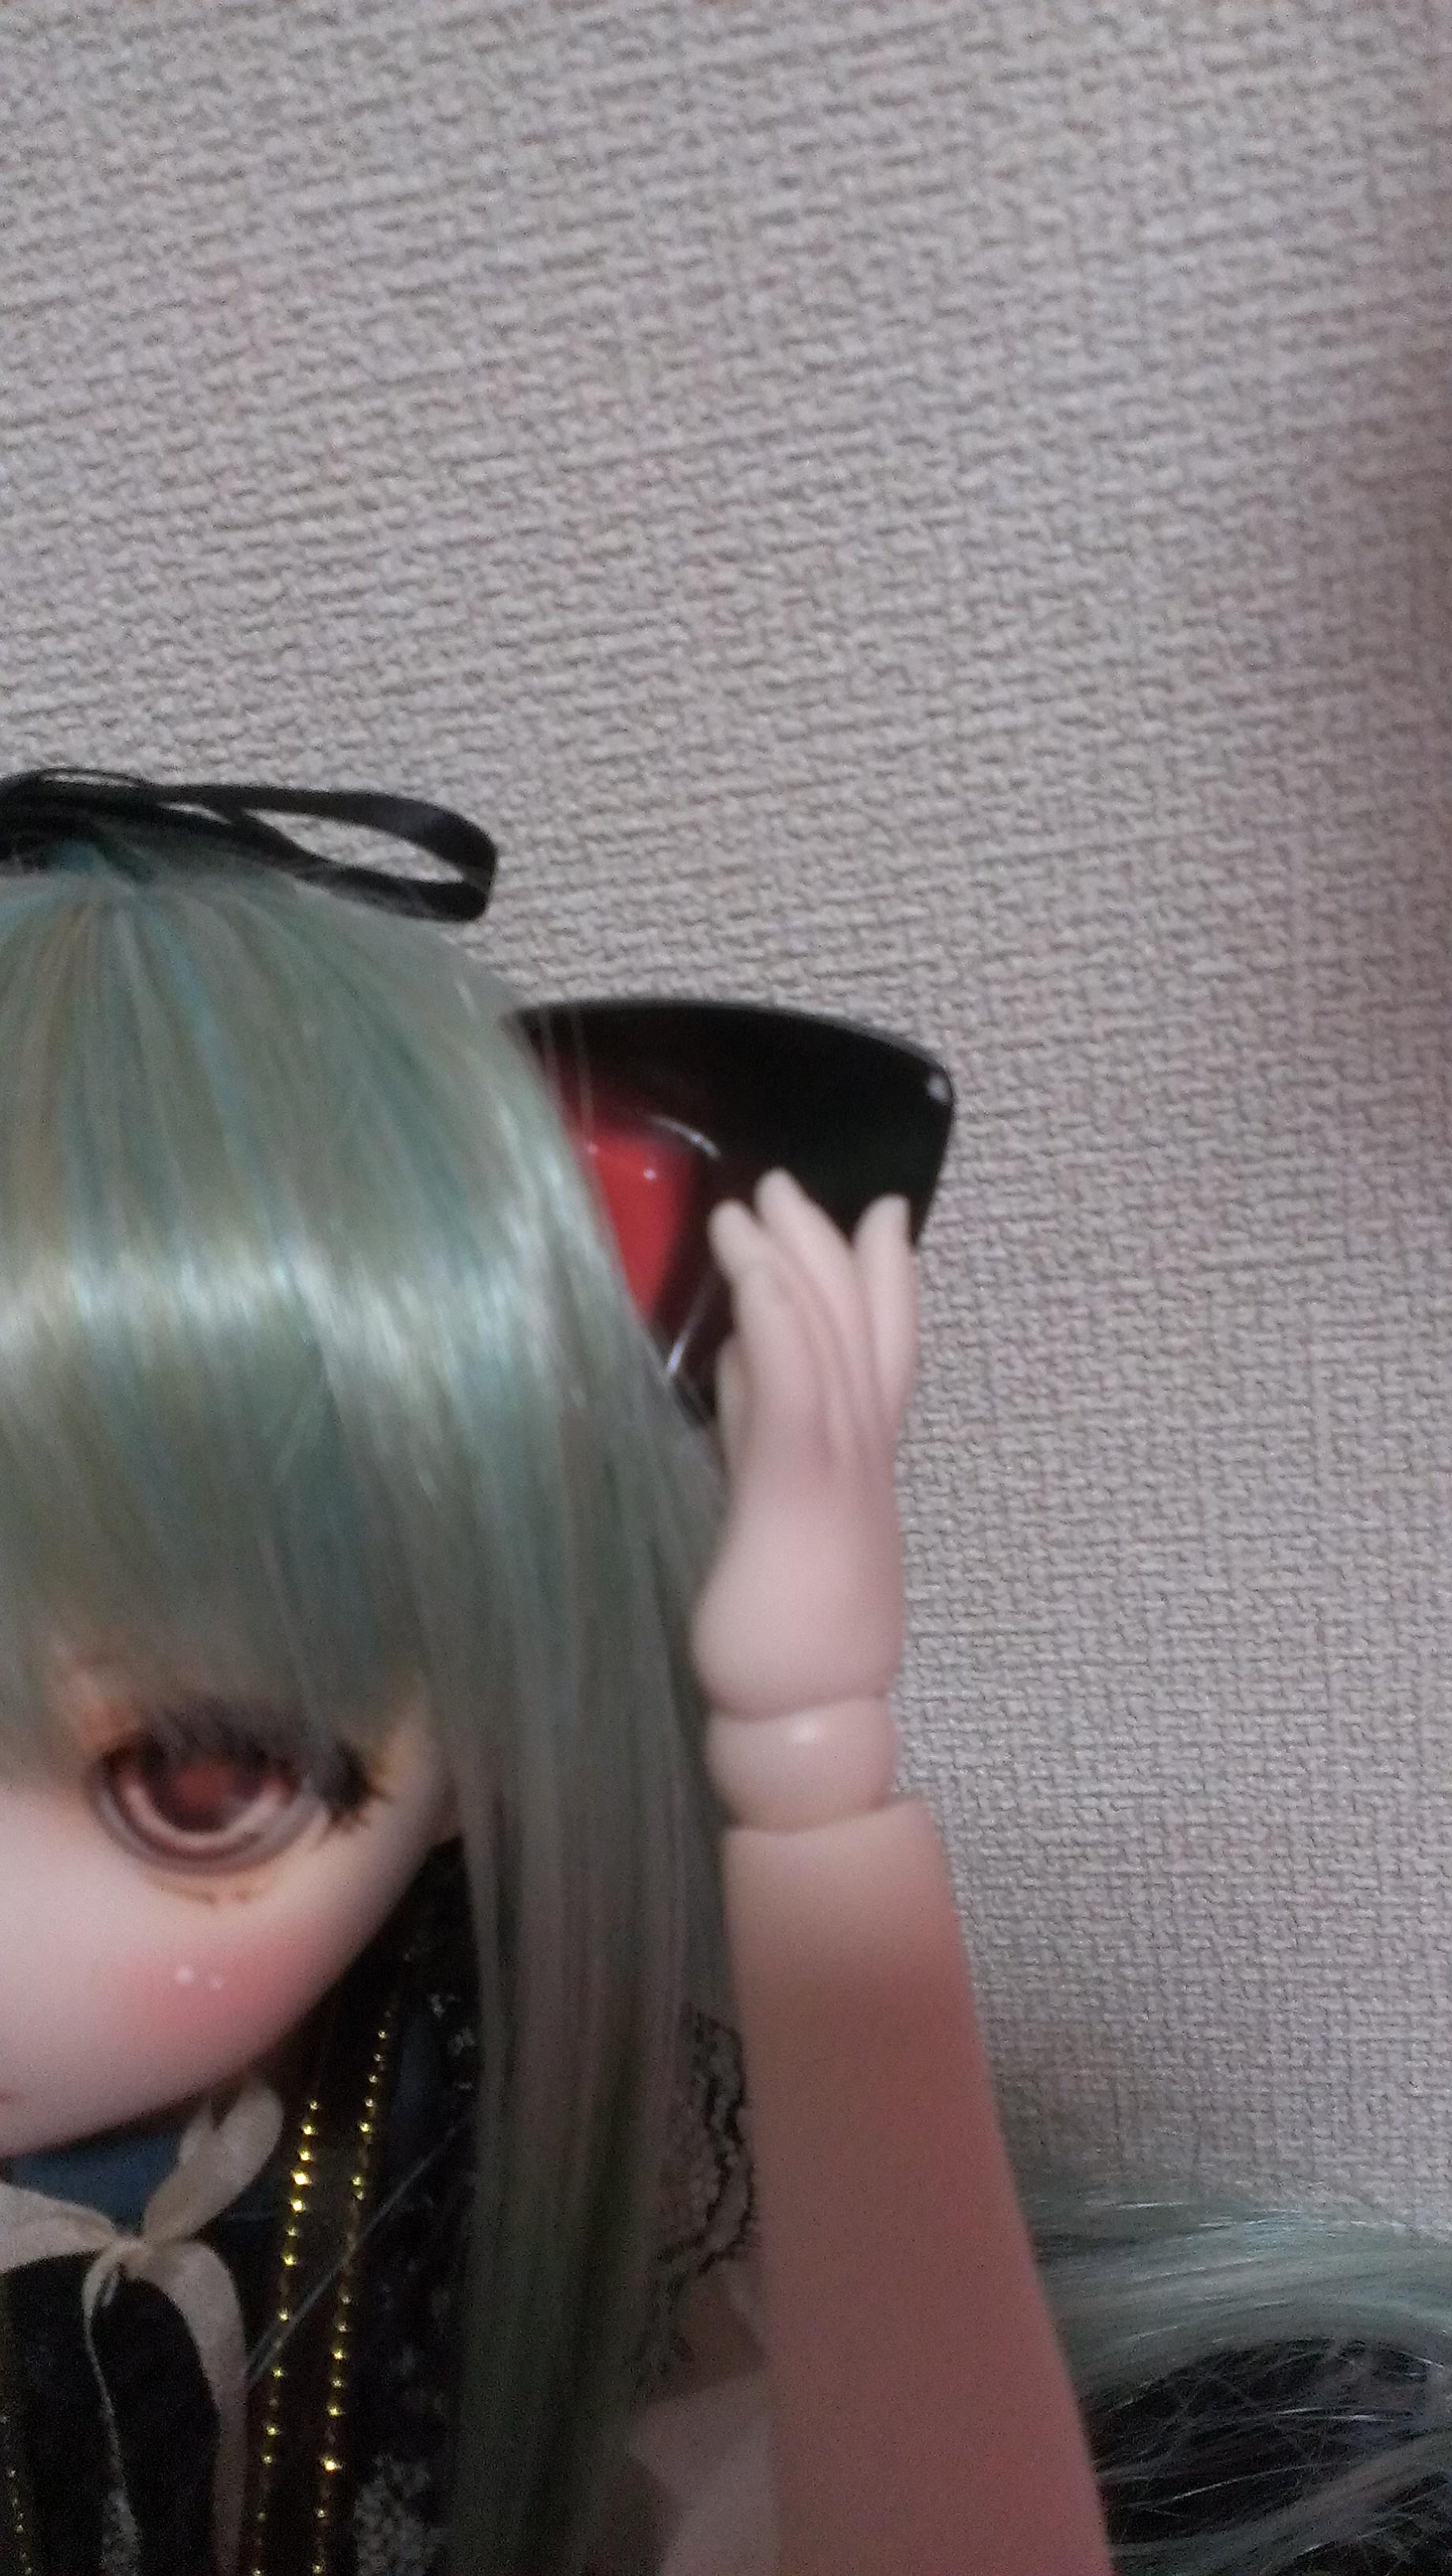 IMAG0579.jpg